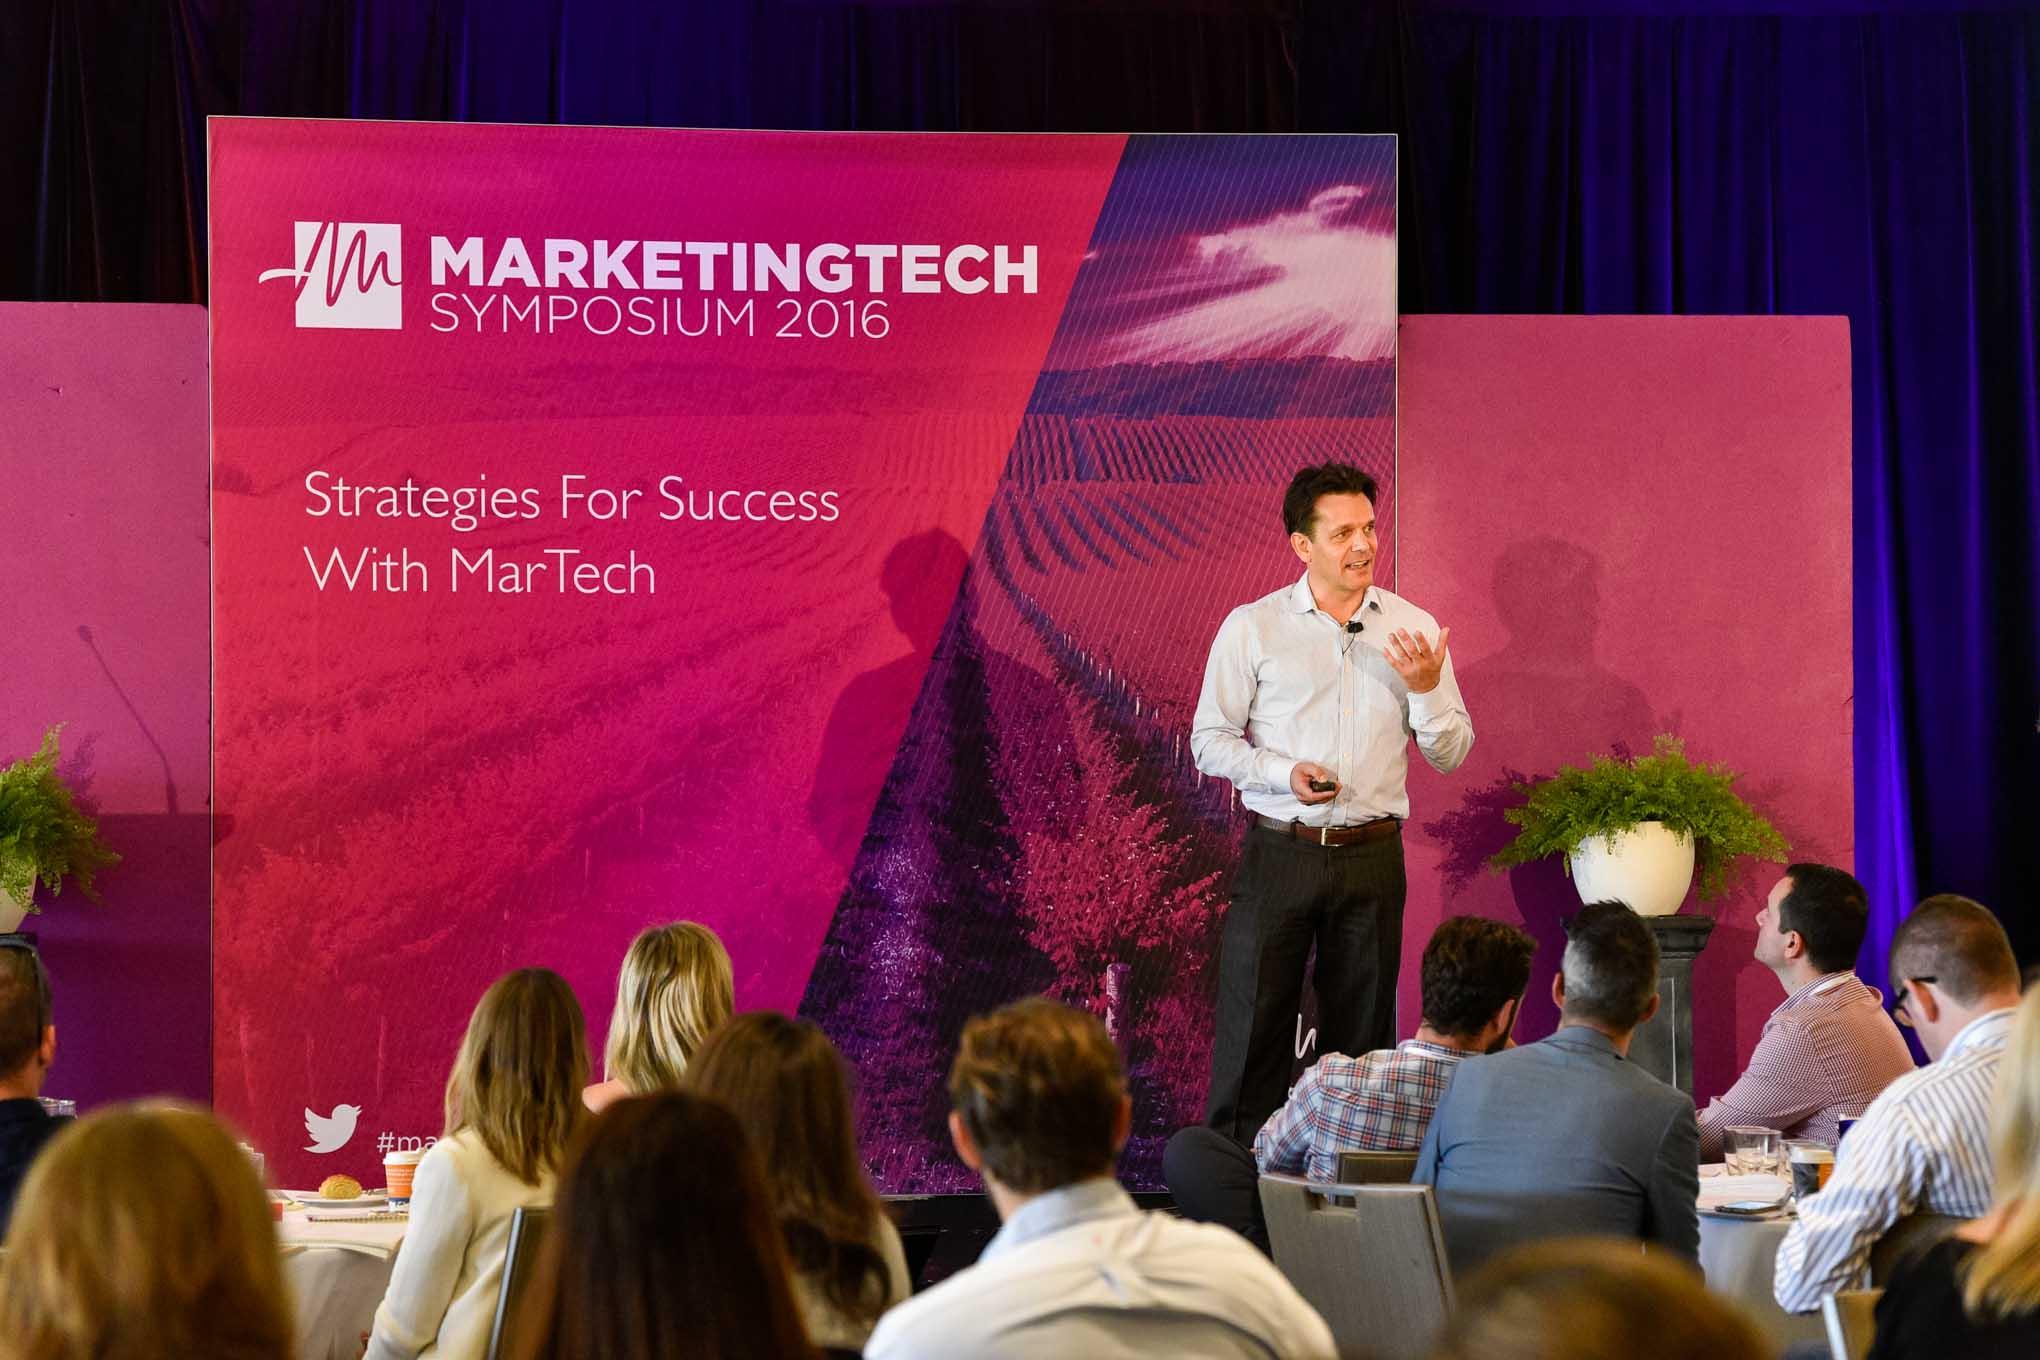 Marketing Tech Symposium Rob Brown